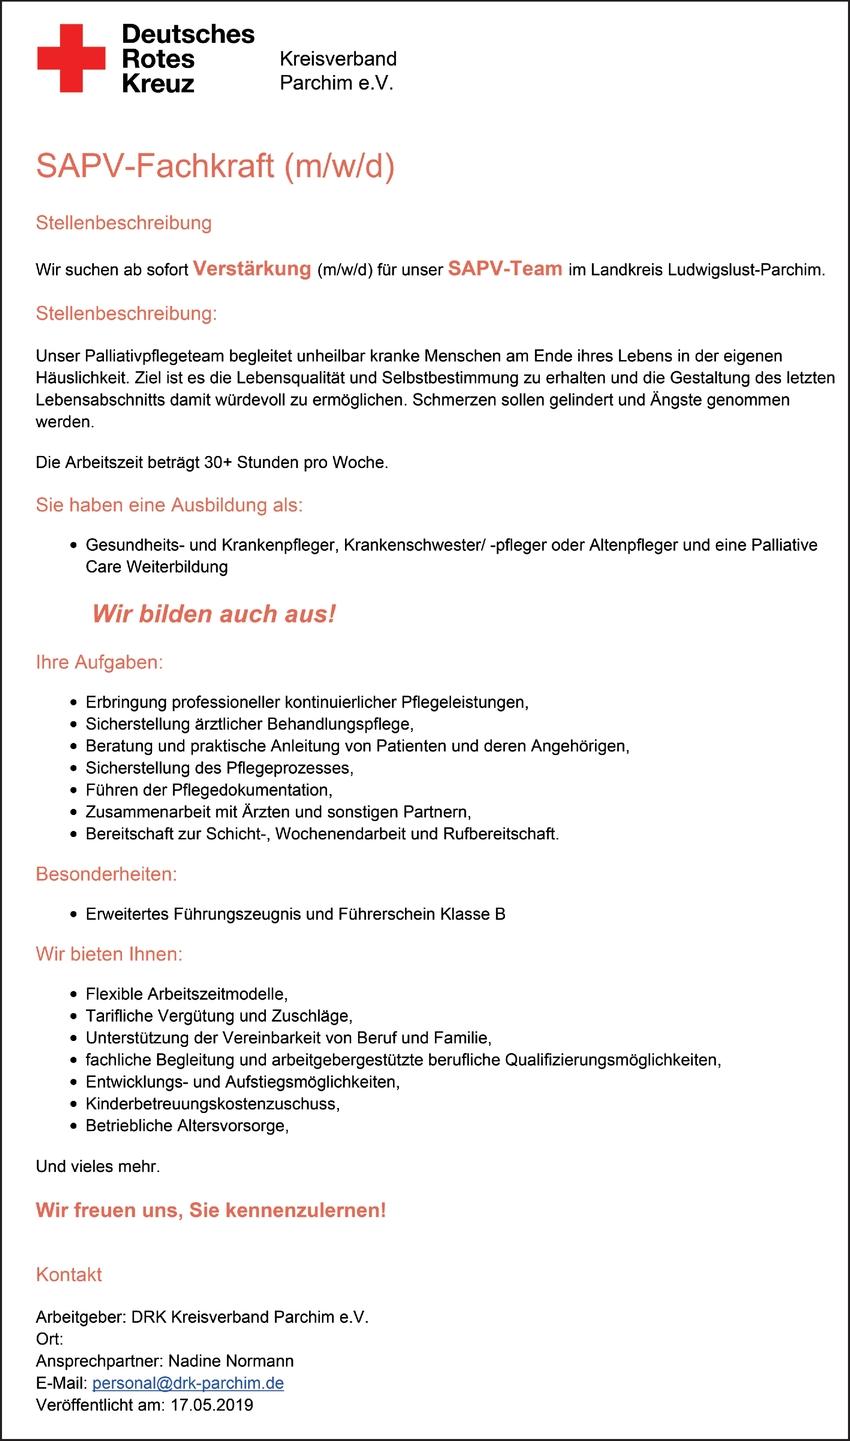 SAPV-Fachkraft (m/w/d)